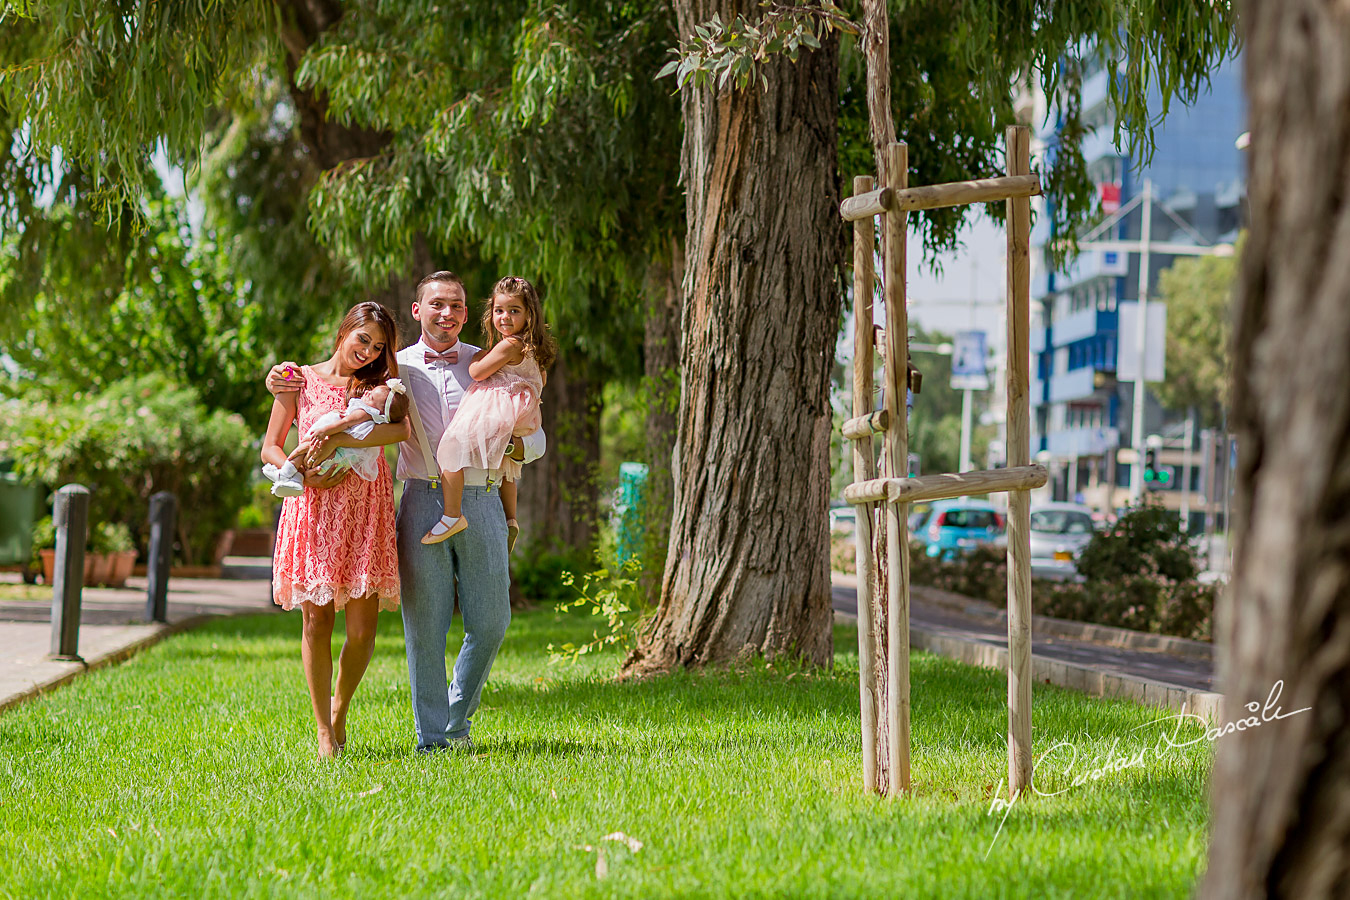 Angelic Christening in Limassol - 07